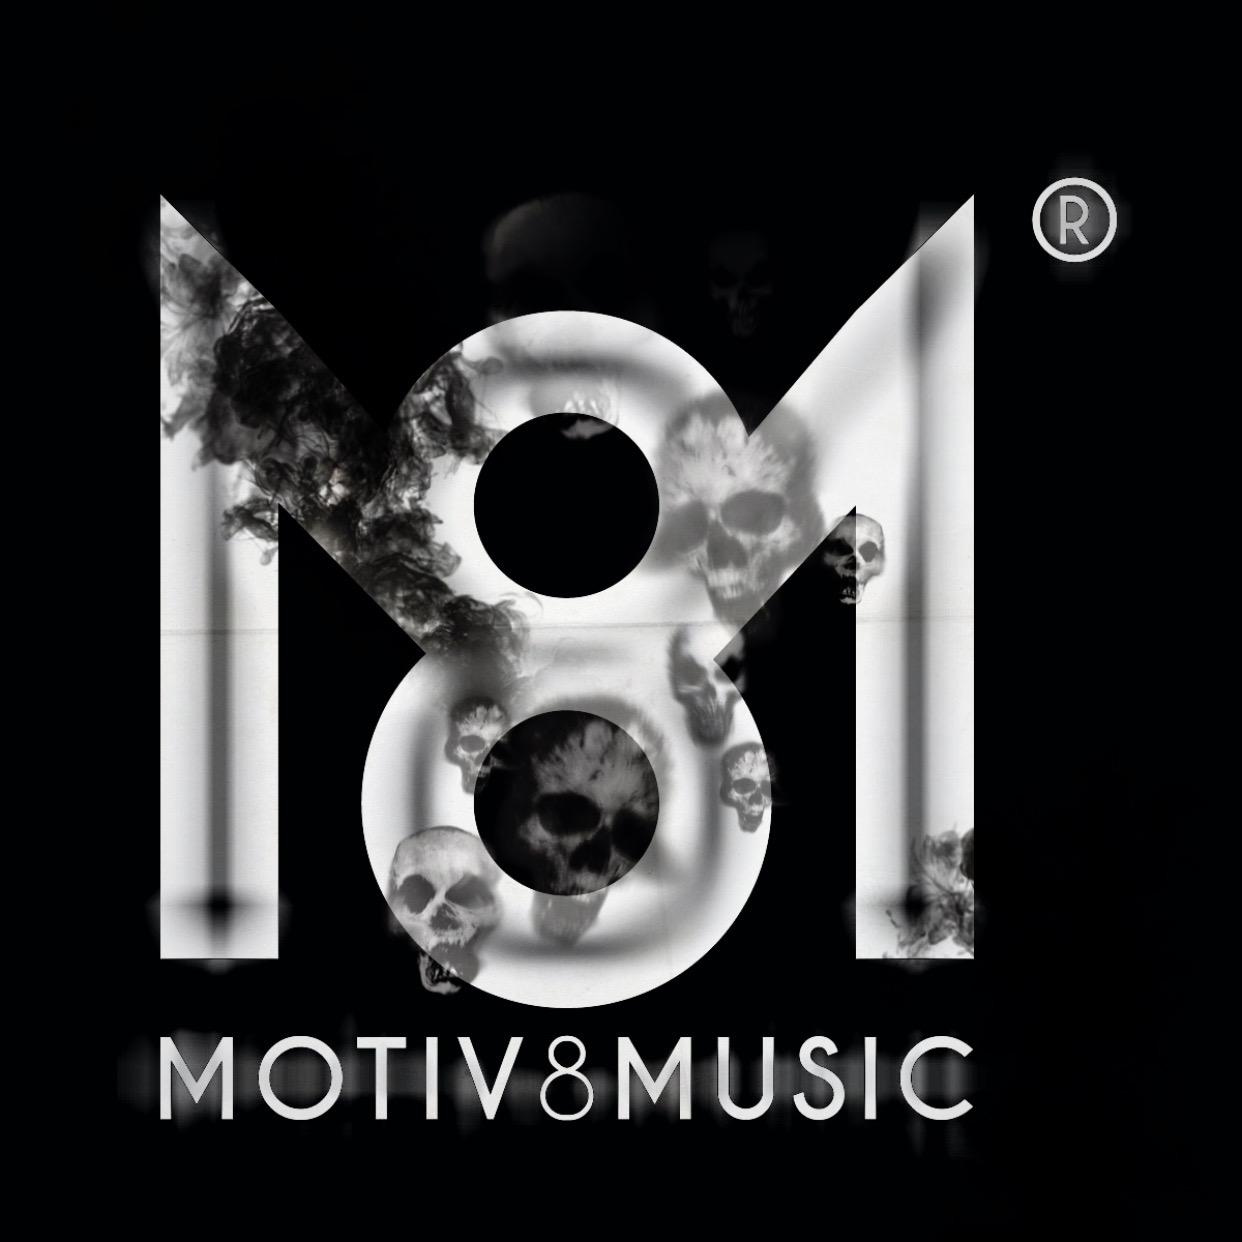 MOTIV8MUSIC